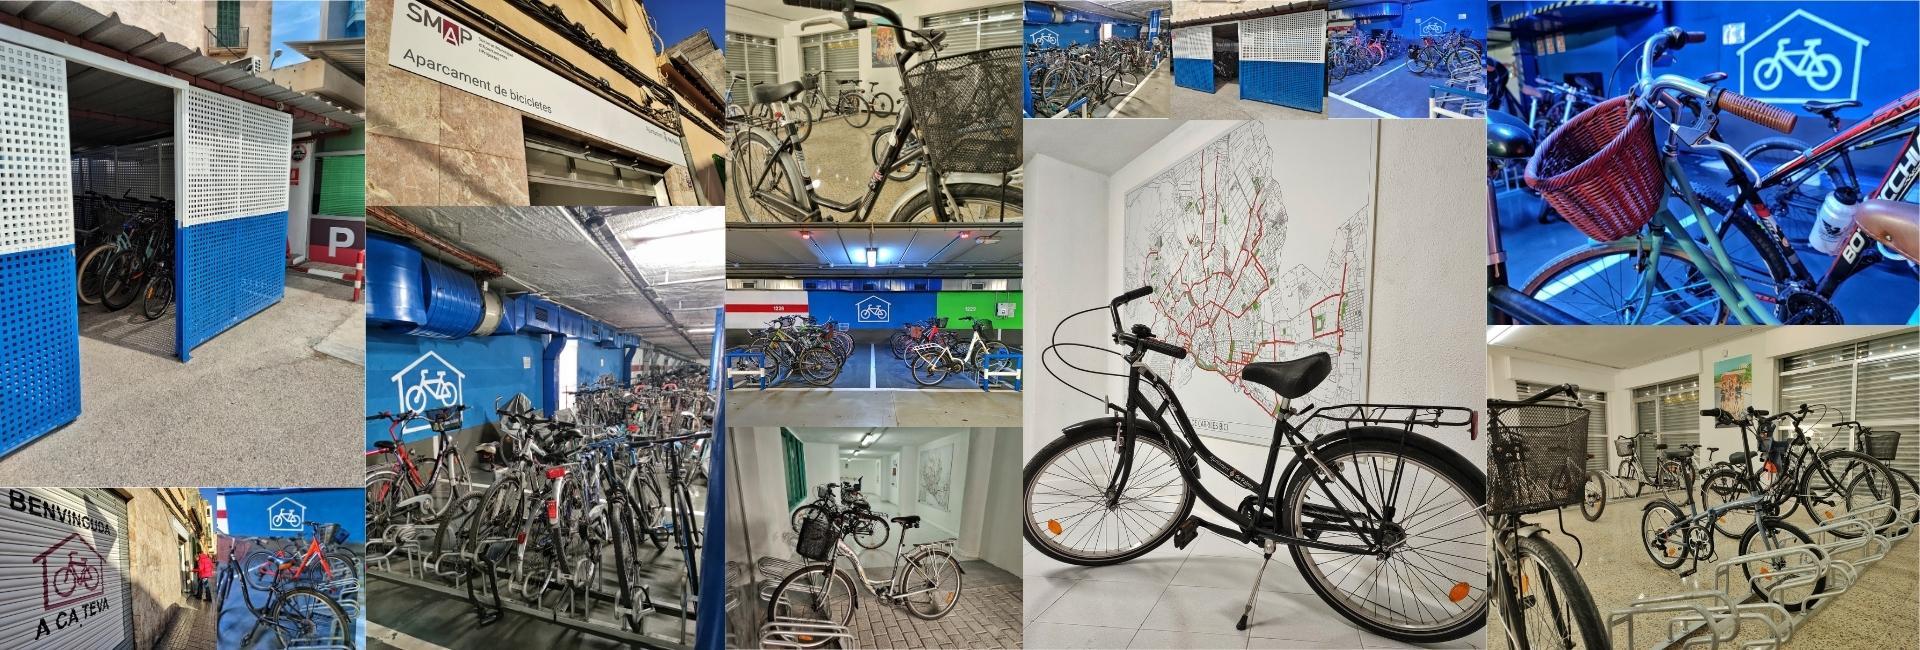 Collage Pere Garau - WEB Aparcament de bicis